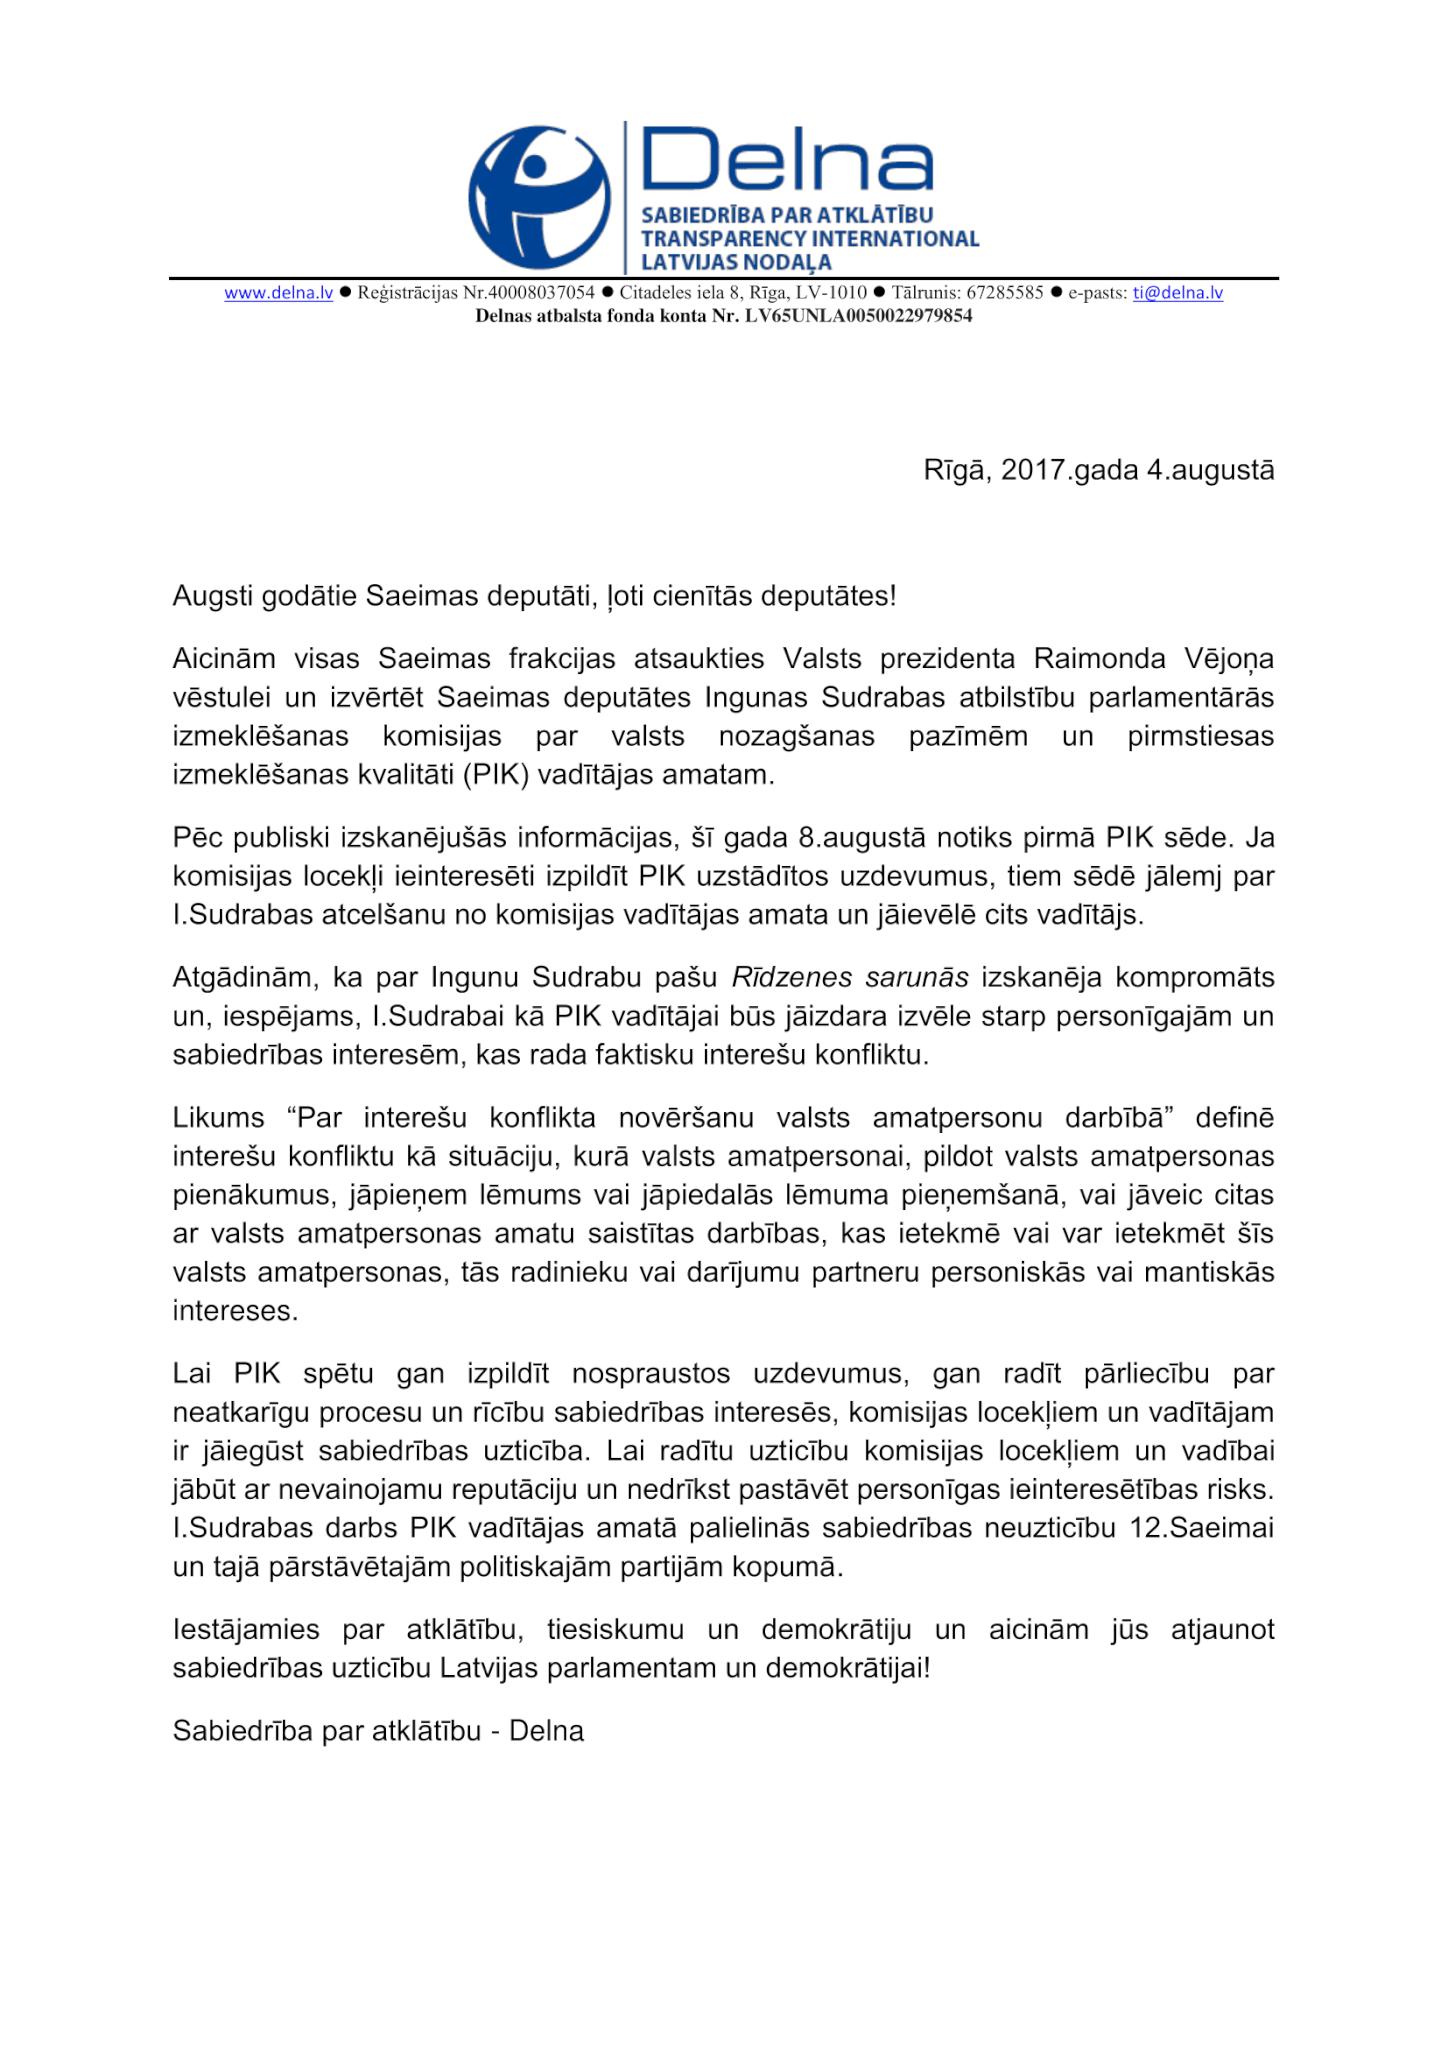 delnas-vestule-saeimai-par-sudrabu-04-08-2017-1